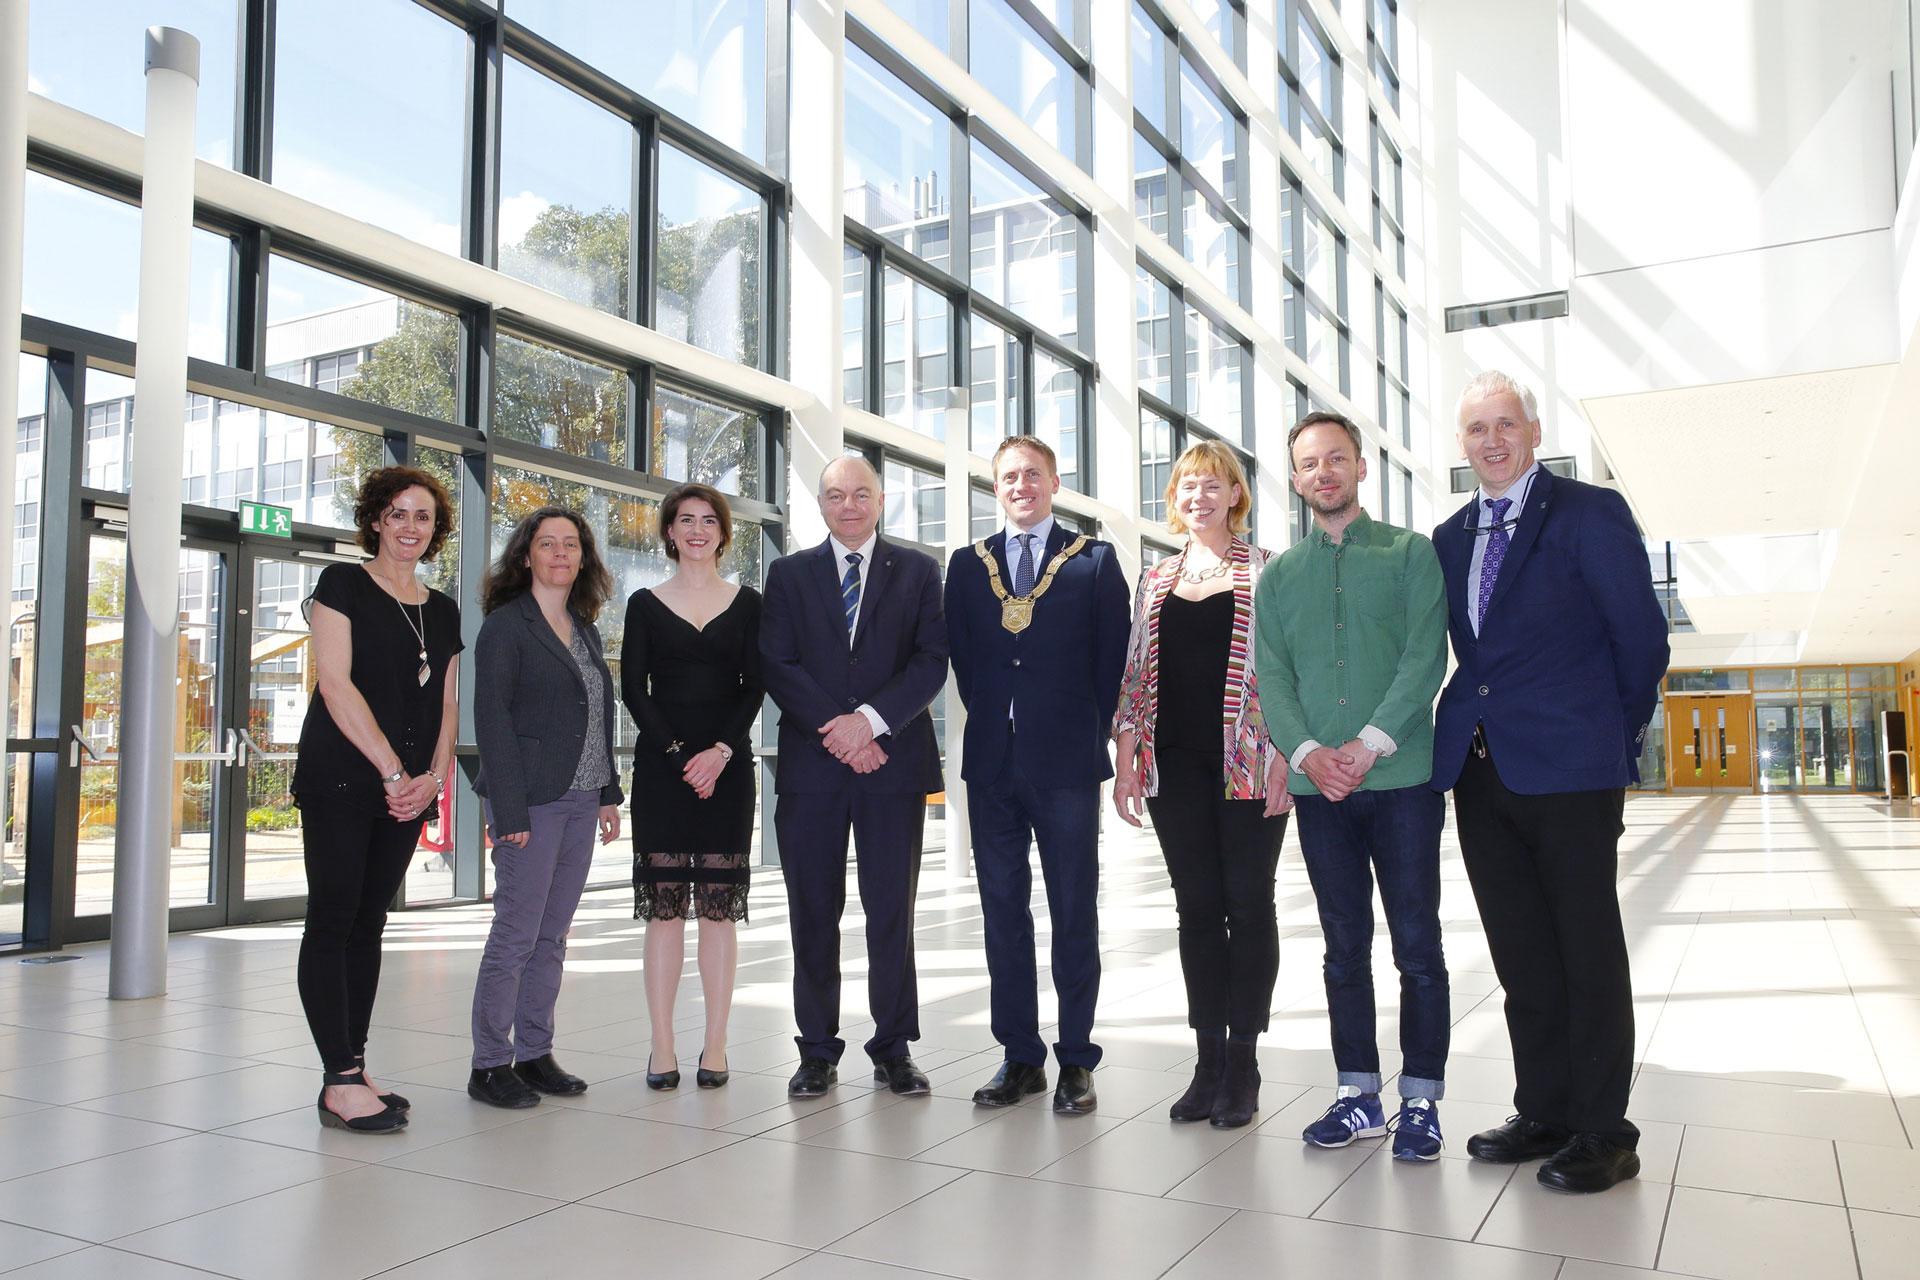 From left: Ciara King, Arts Officer, Dún Laoghaire-Rathdown; Prof Lorraine Hanlon, co-founder UCD Parity Studios; Méadhbh O'Connor, artist; Prof Andrew Deeks, President UCD; An Cathaoirleach, Cllr Cormac Devlin; Emer O Boyle, co-founder UCD Parity Studios; David Beattie, artist; Prof Joe Carthy, Principal, UCD Science. Photo: Peter Cavanagh, 2017